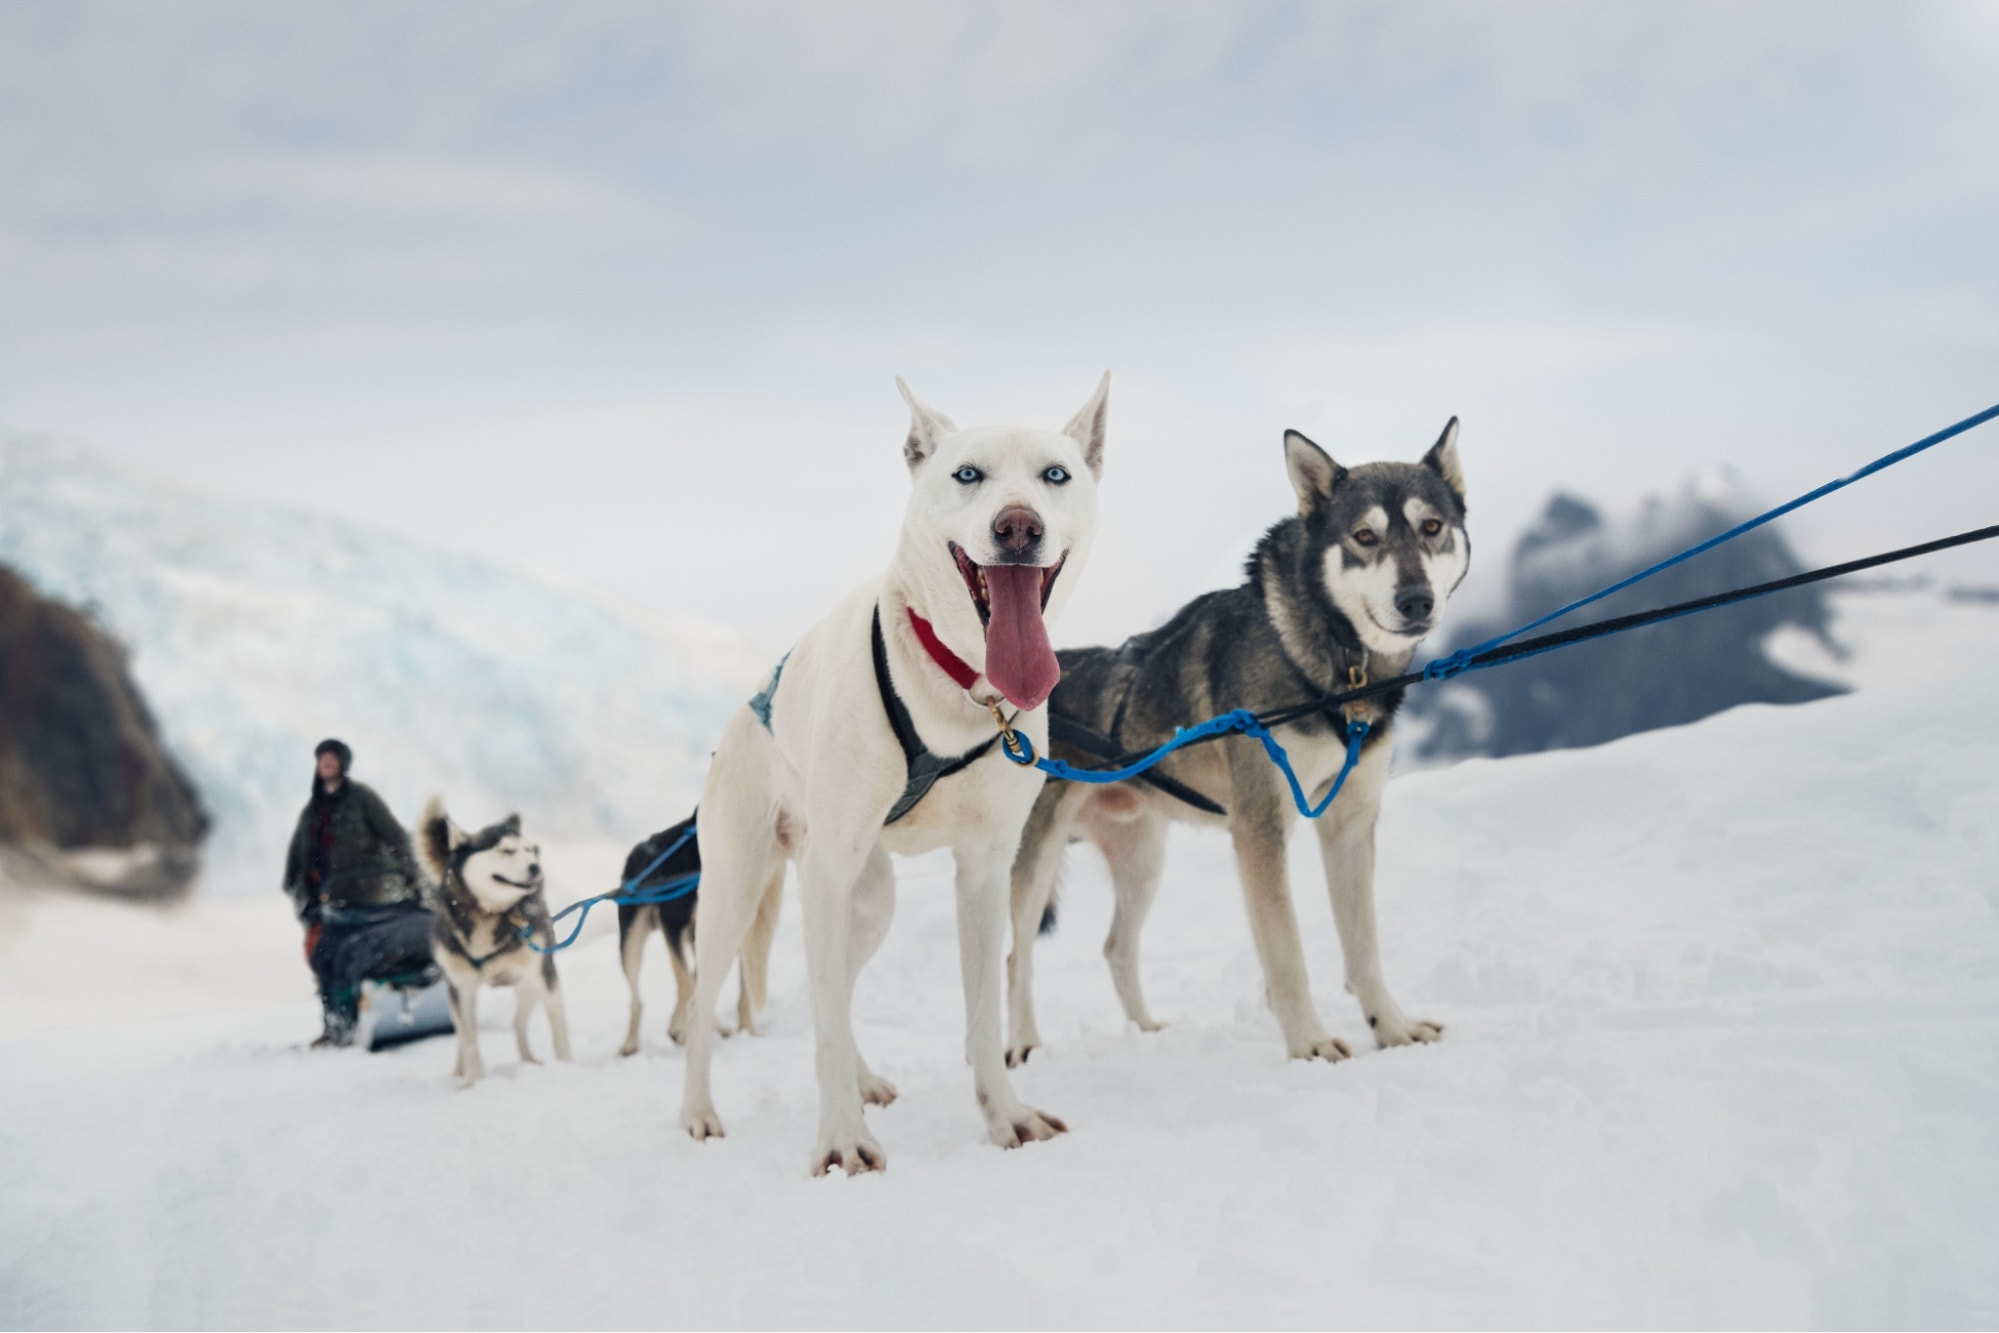 Dog Sledding on the Mendenhall Glacier, Alaska